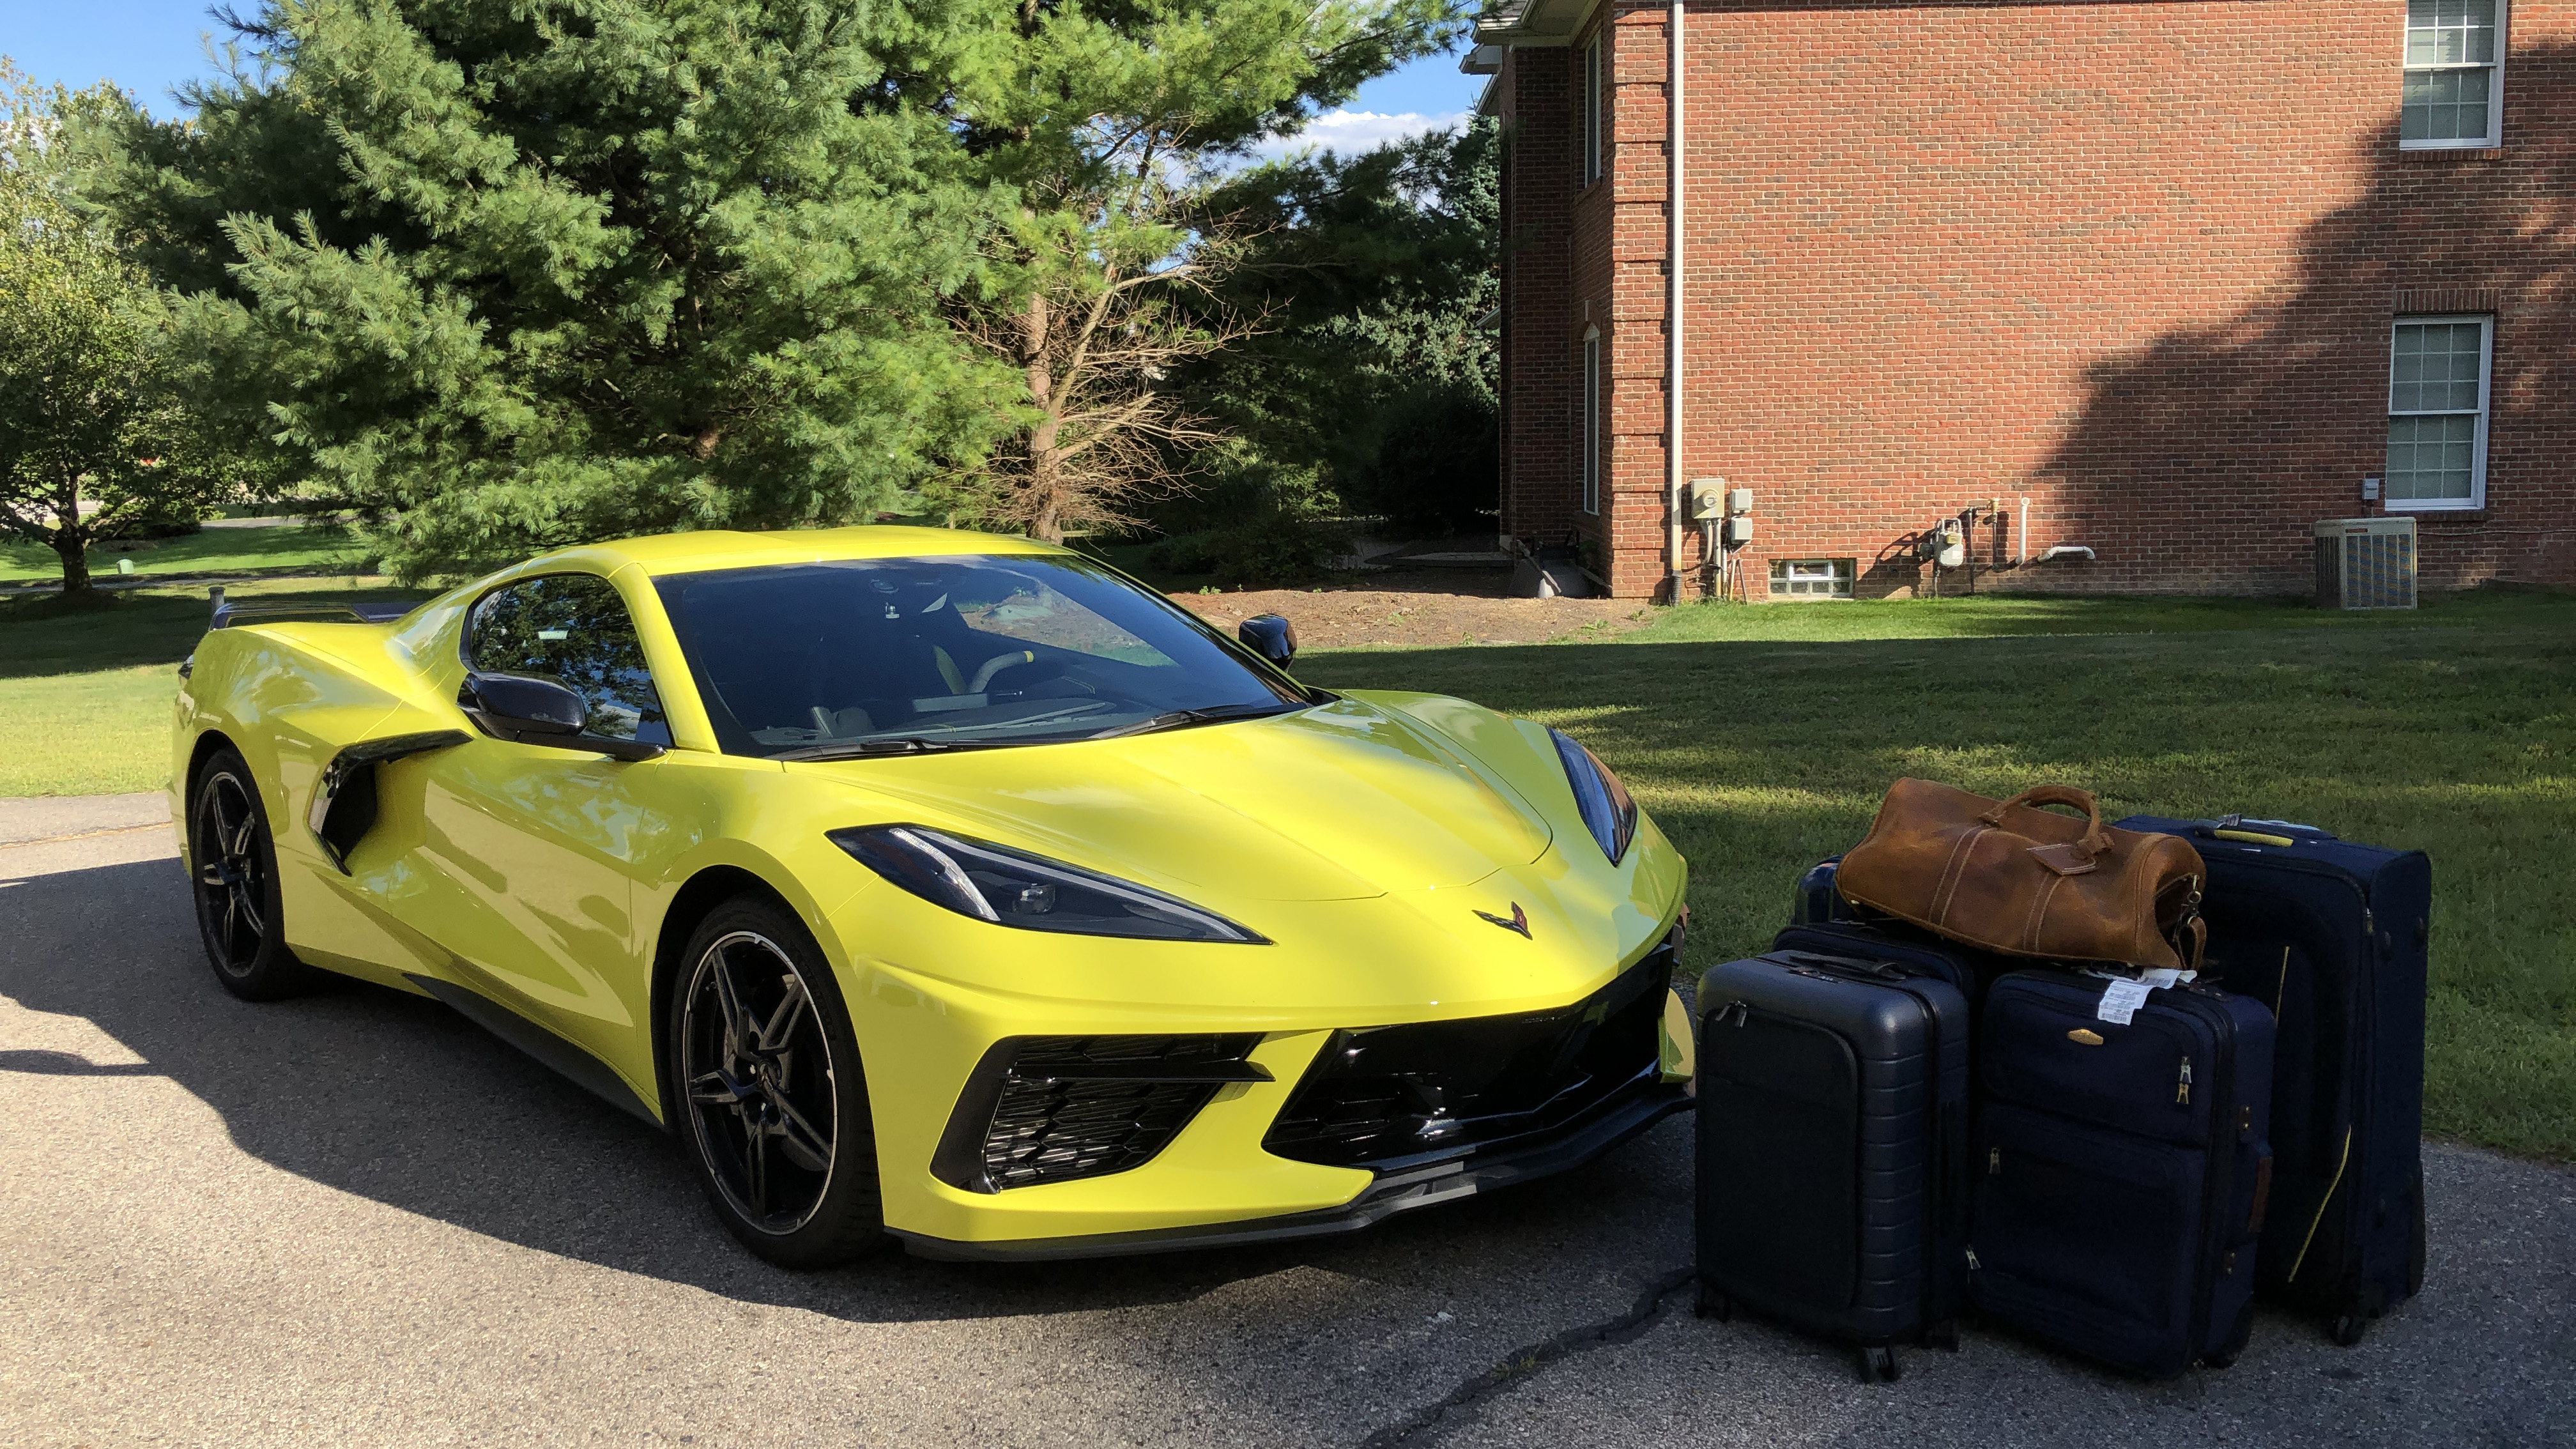 2020 Chevrolet Corvette Luggage Test Capacity Photos Suitcases Autoblog